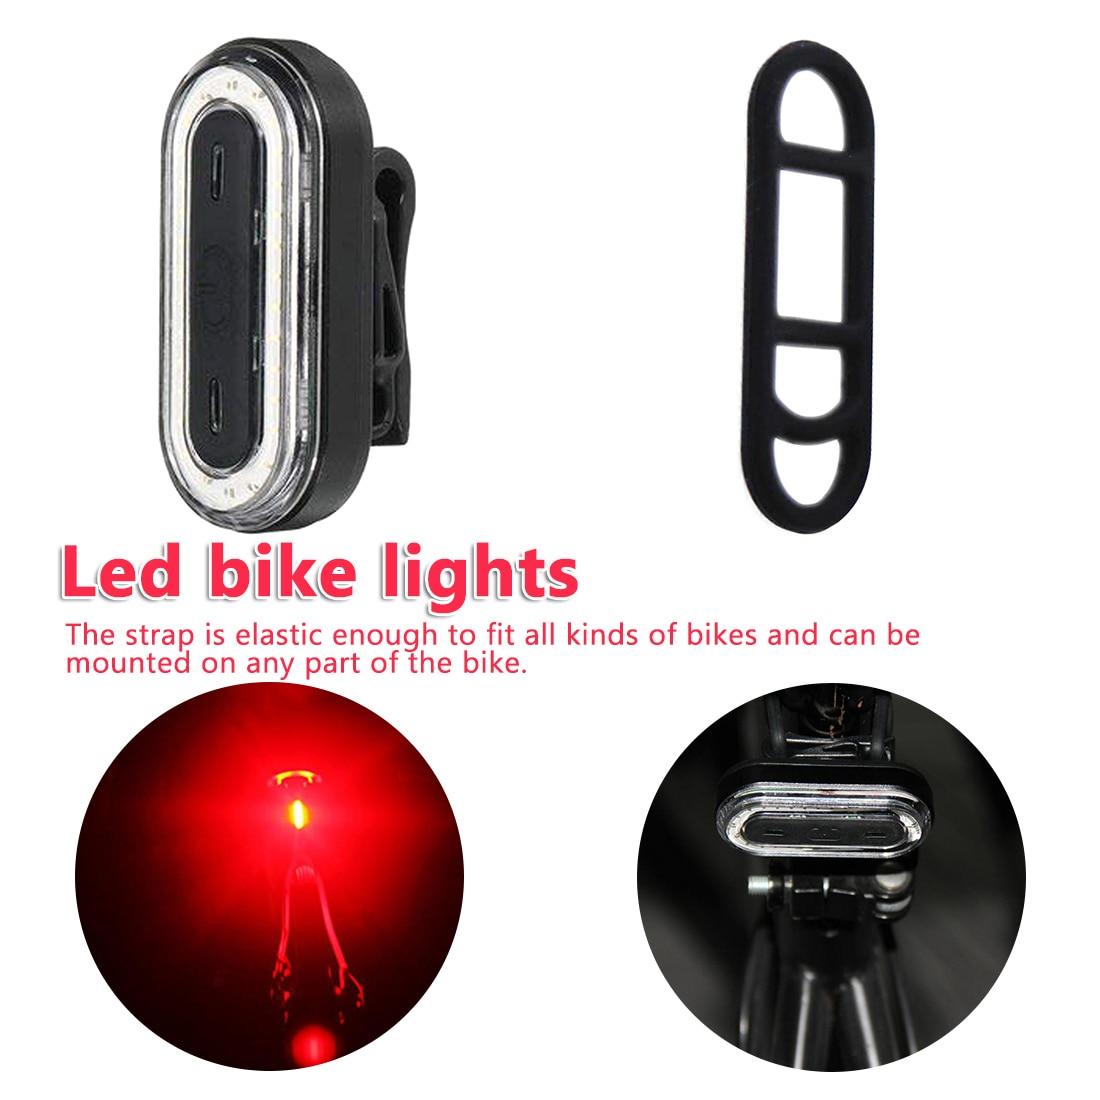 Helmet Light Powerful Bicycle Waterproof Bike Rear Light  Bicycle Light Rechargeable Rearlight Bike Light